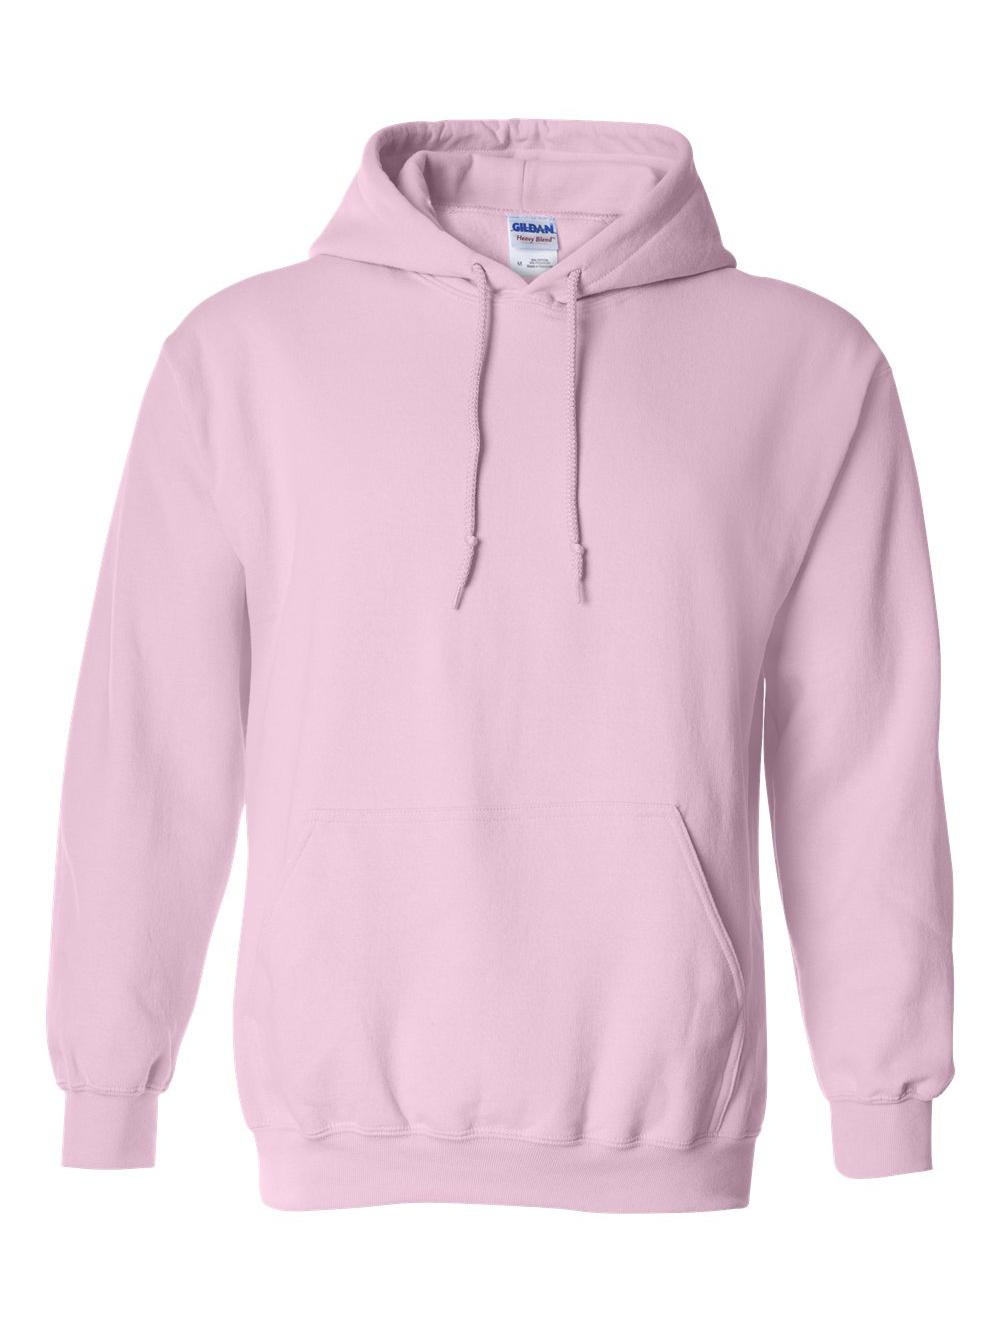 Gildan-Heavy-Blend-Hooded-Sweatshirt-18500 miniatura 75